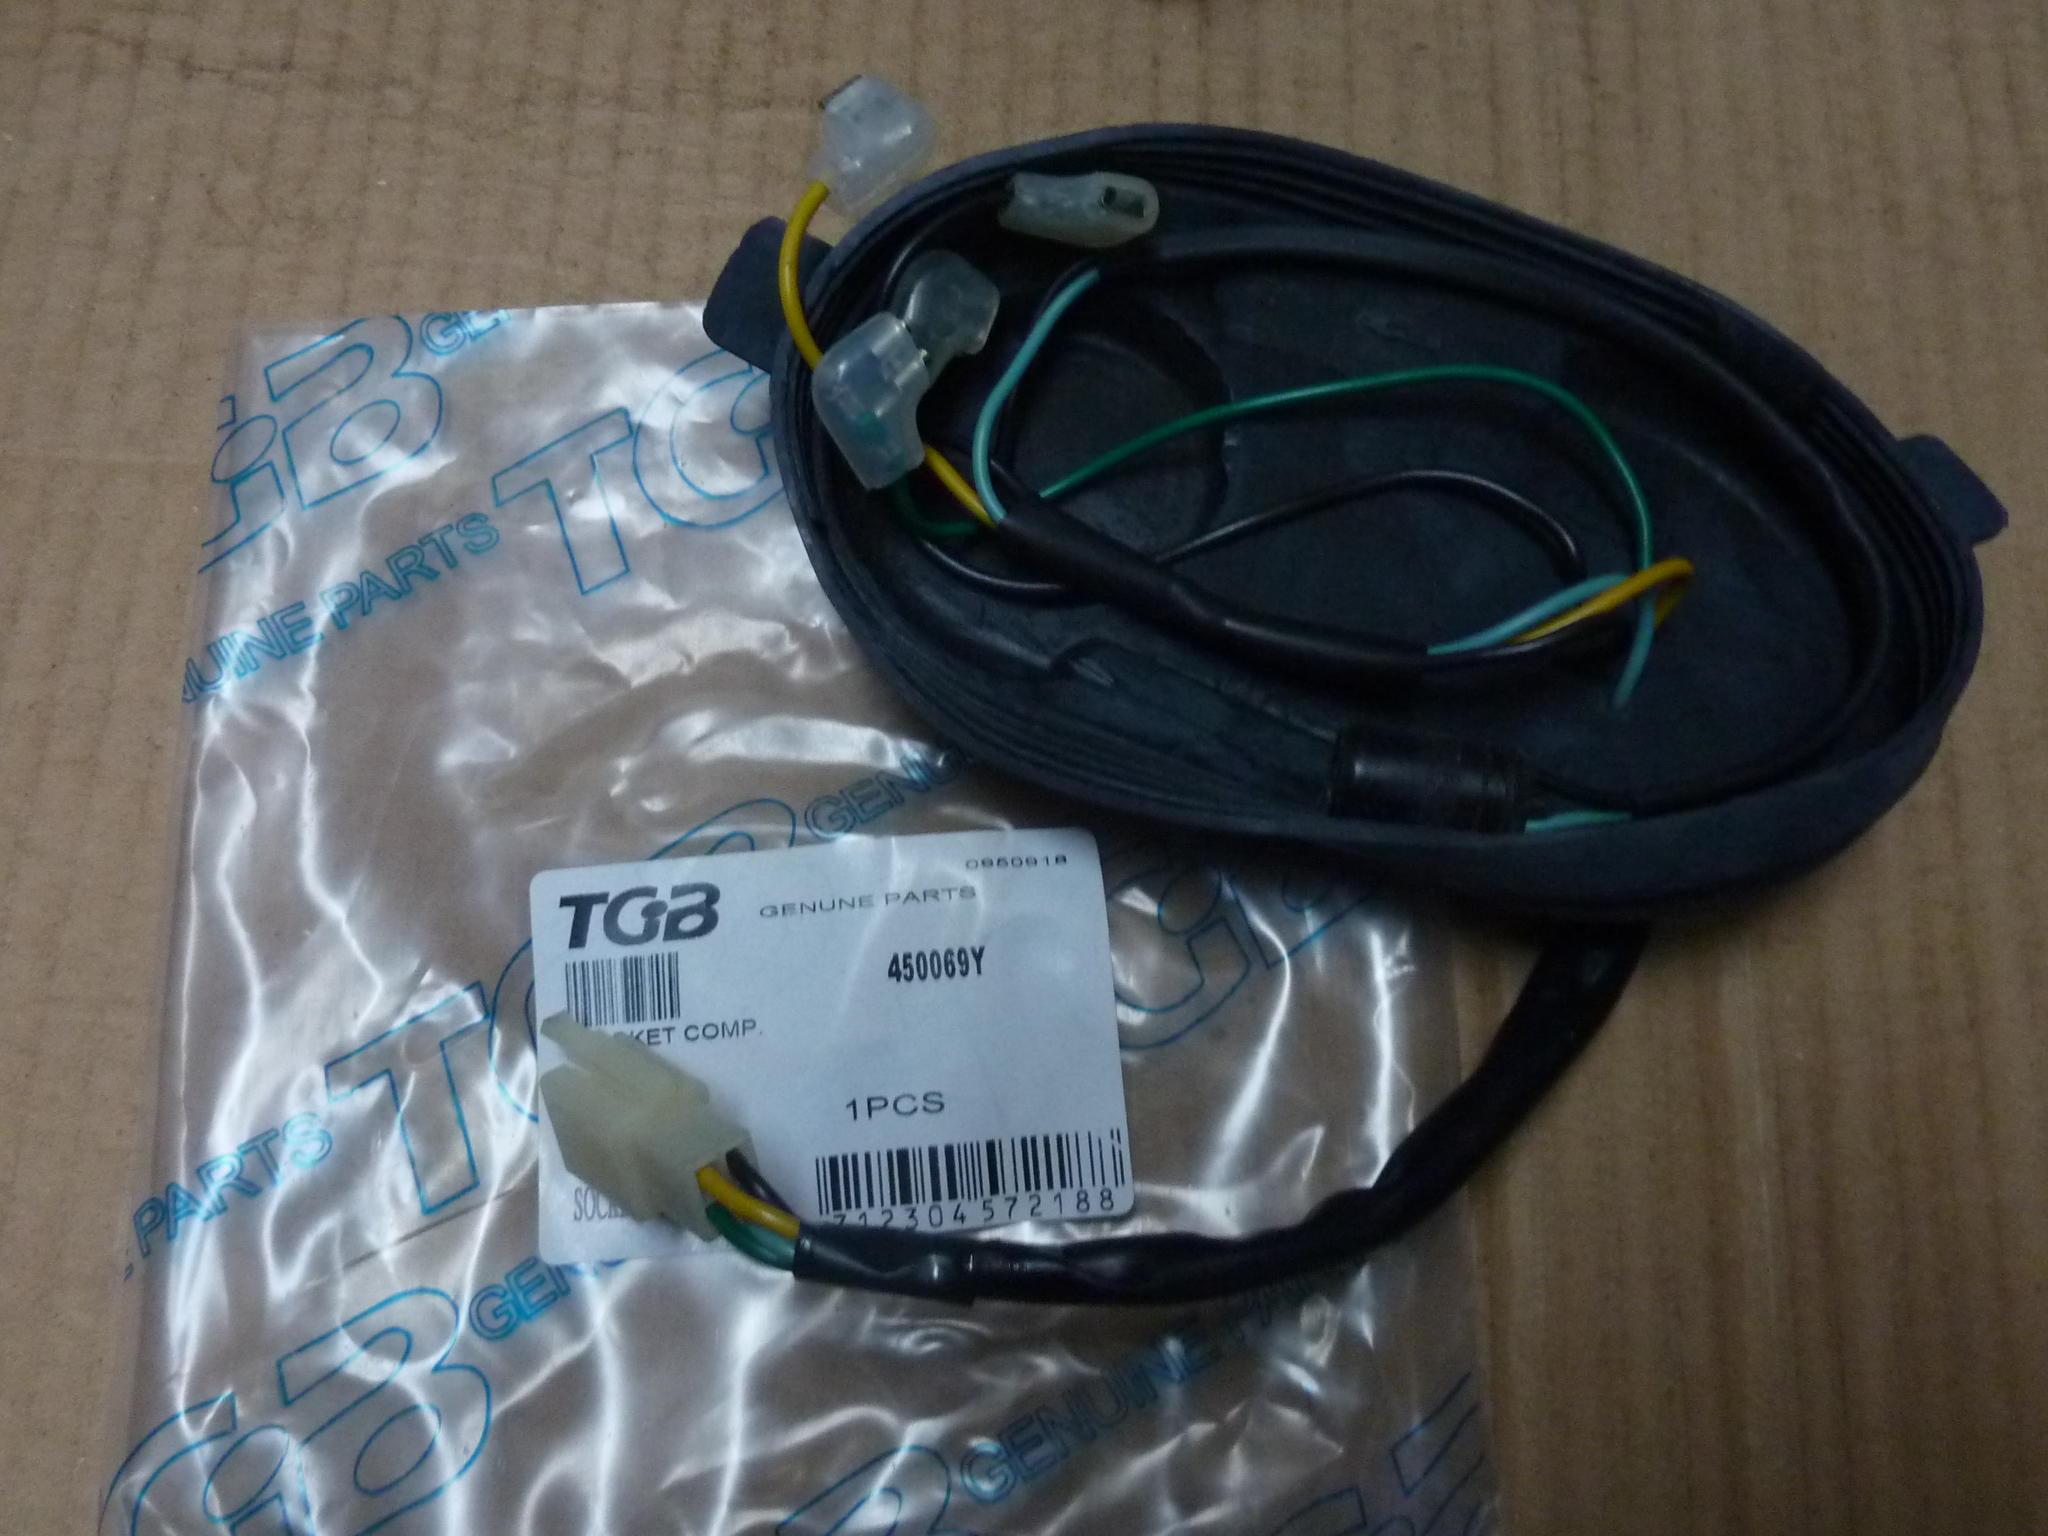 450069Y SOCKET WIRING LOOM HARNESS HEADLIGHT TGB R50X R125X ...